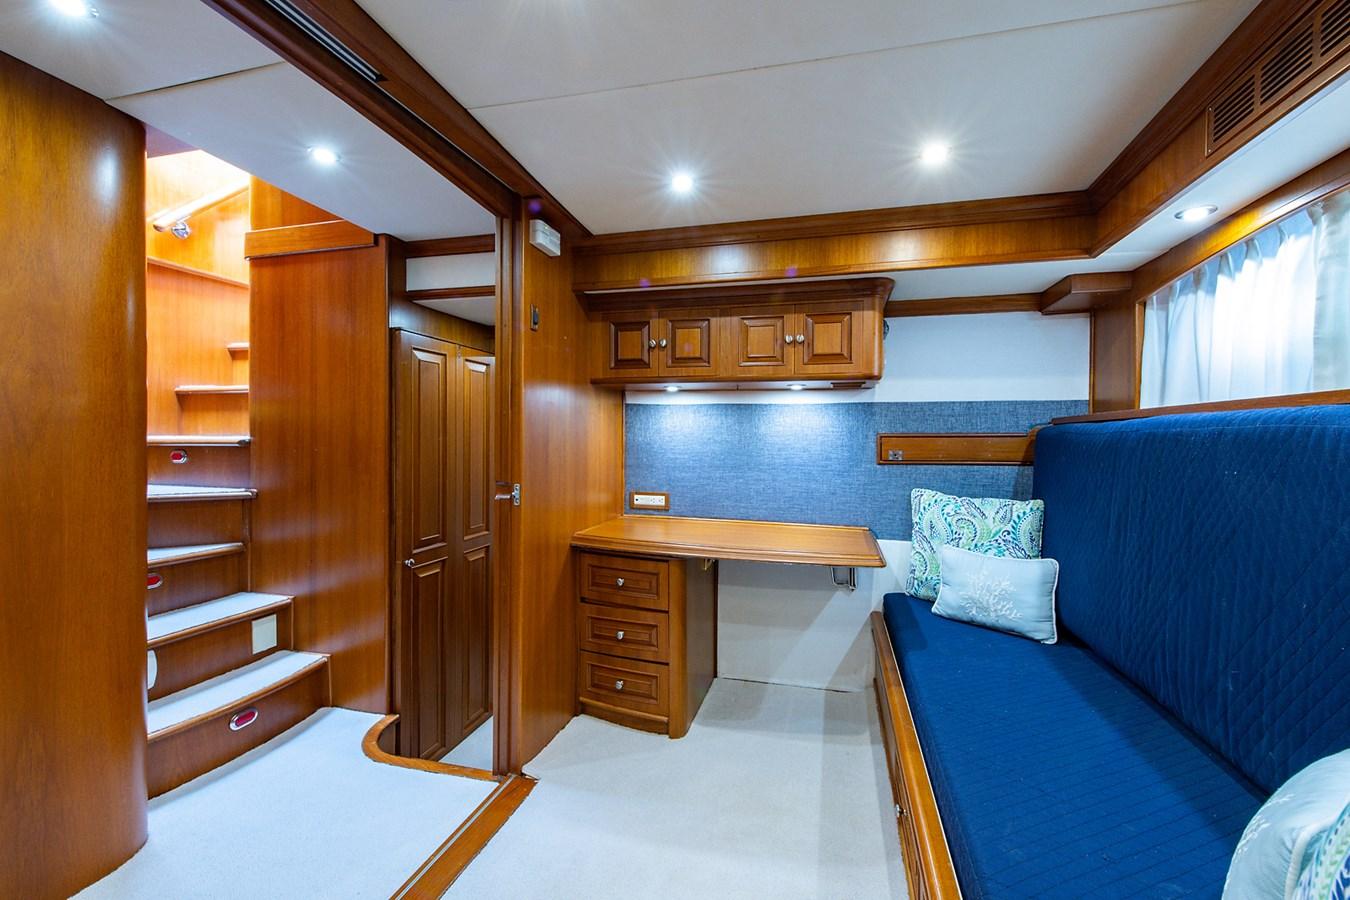 Tout Va Bien_Guest Stateroom-Den7 2005 GRAND BANKS 64 Aleutian RP Motor Yacht 2726174